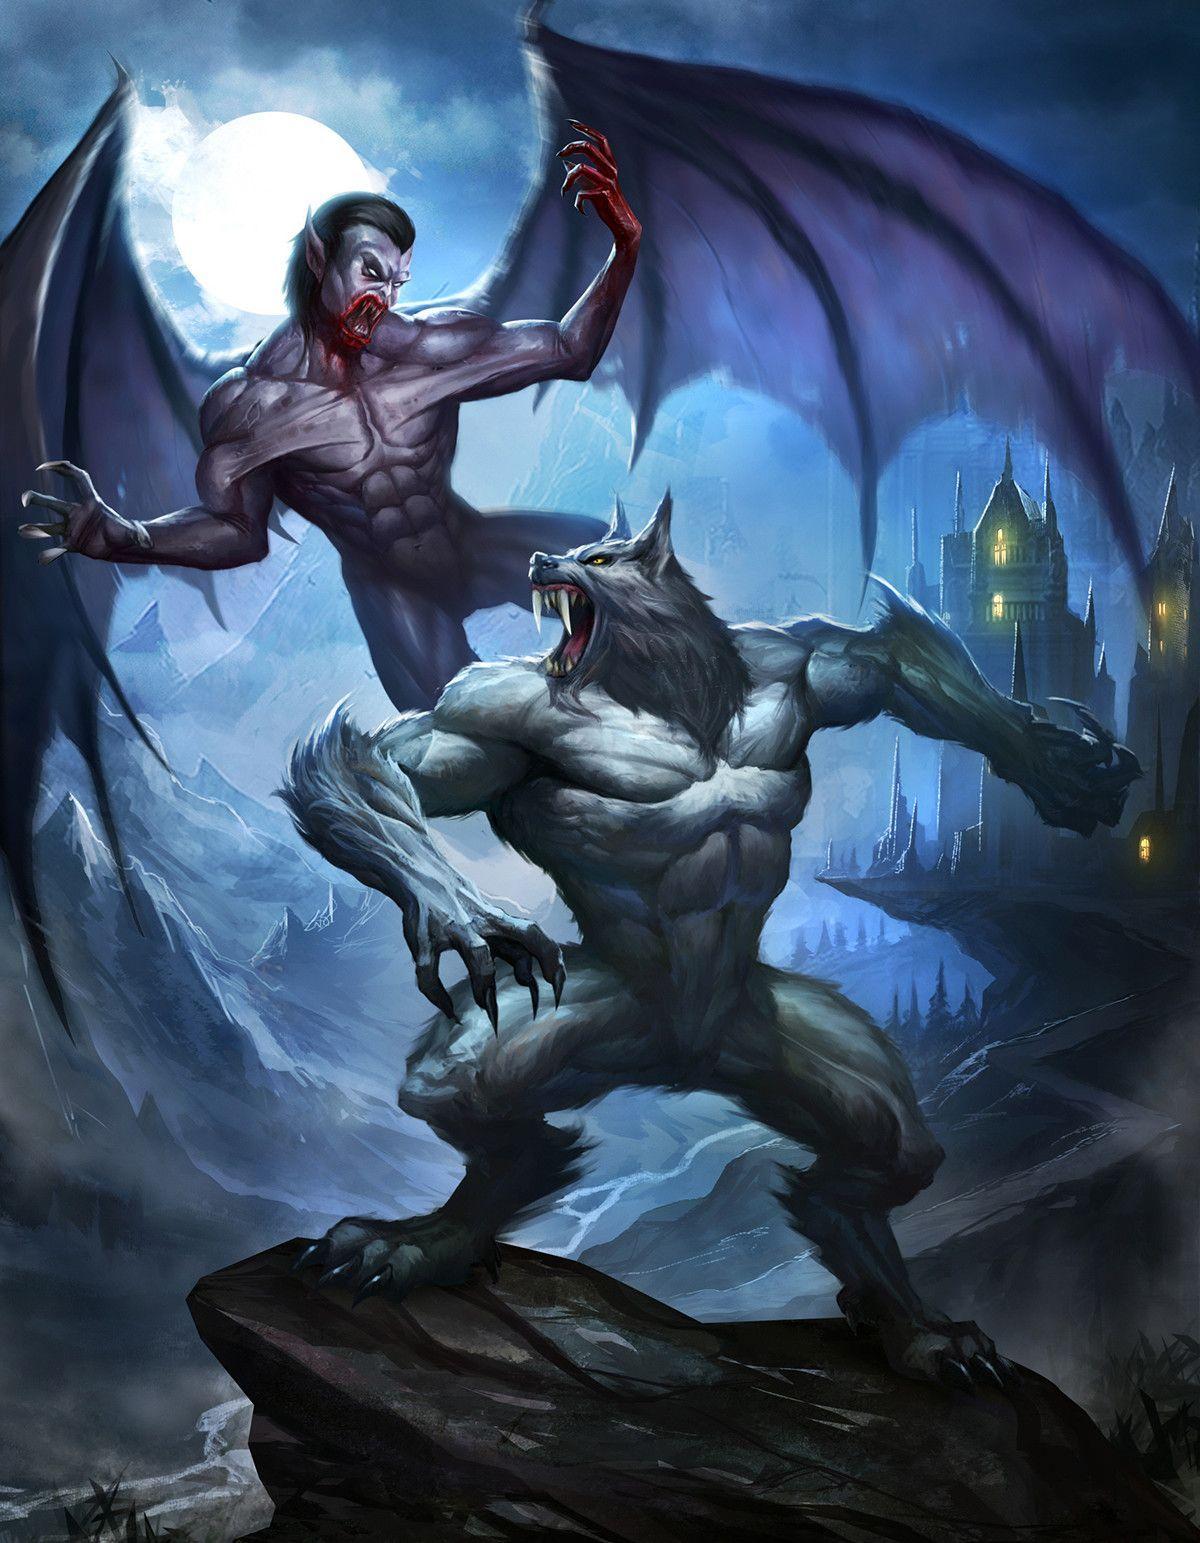 Card Game Licantropo Contra Vampiro Guerras Milenarias Imagenes Efectivas Que Le Proporcionamos Sobre Hombre Amigos Lobisomens Desenhos Lobisomem Lobisomem